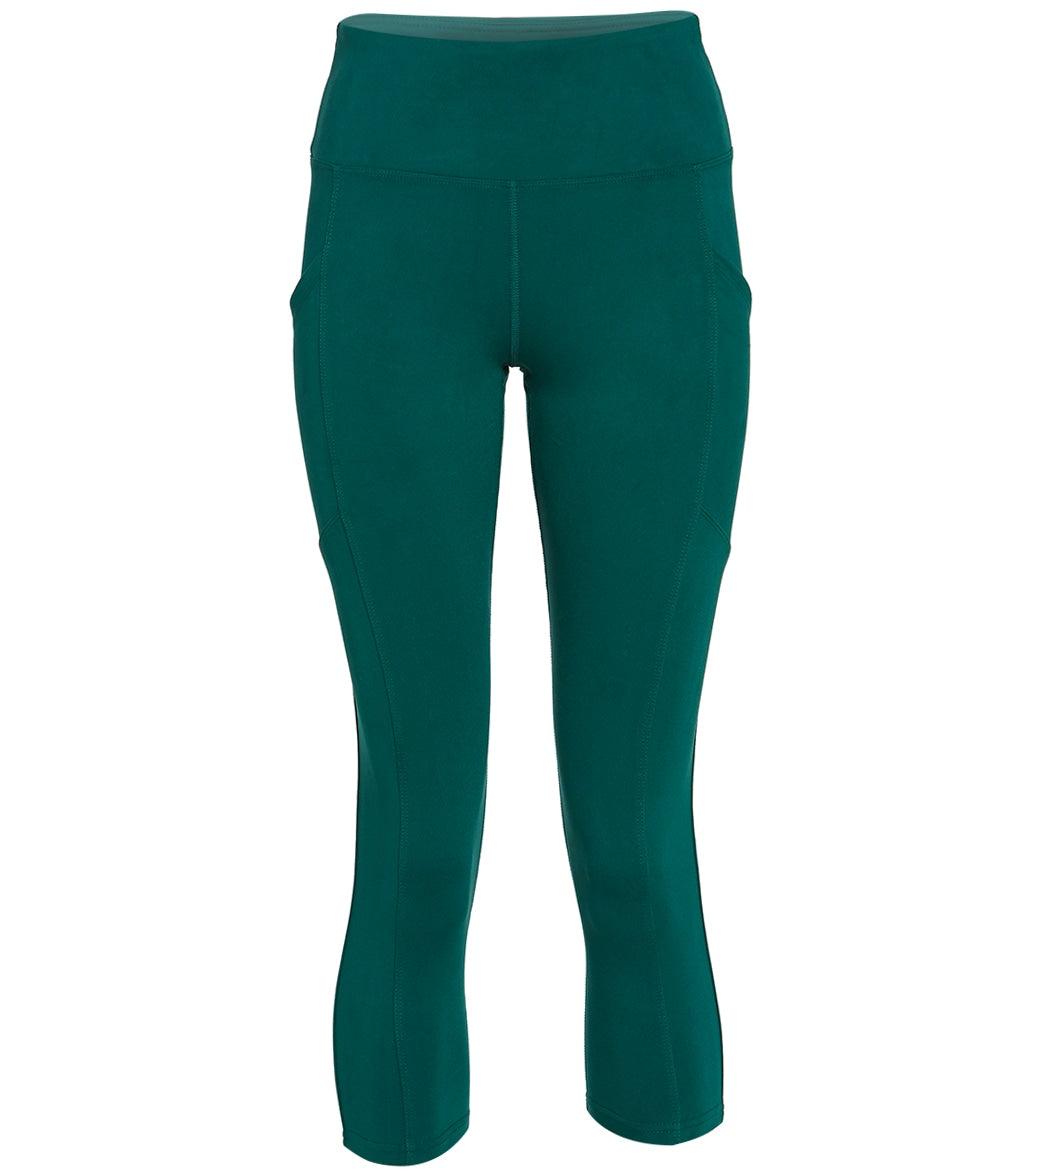 Balance Collection Women's Eclipse Yoga Capri Pants - Botanical Garden Small Cotton